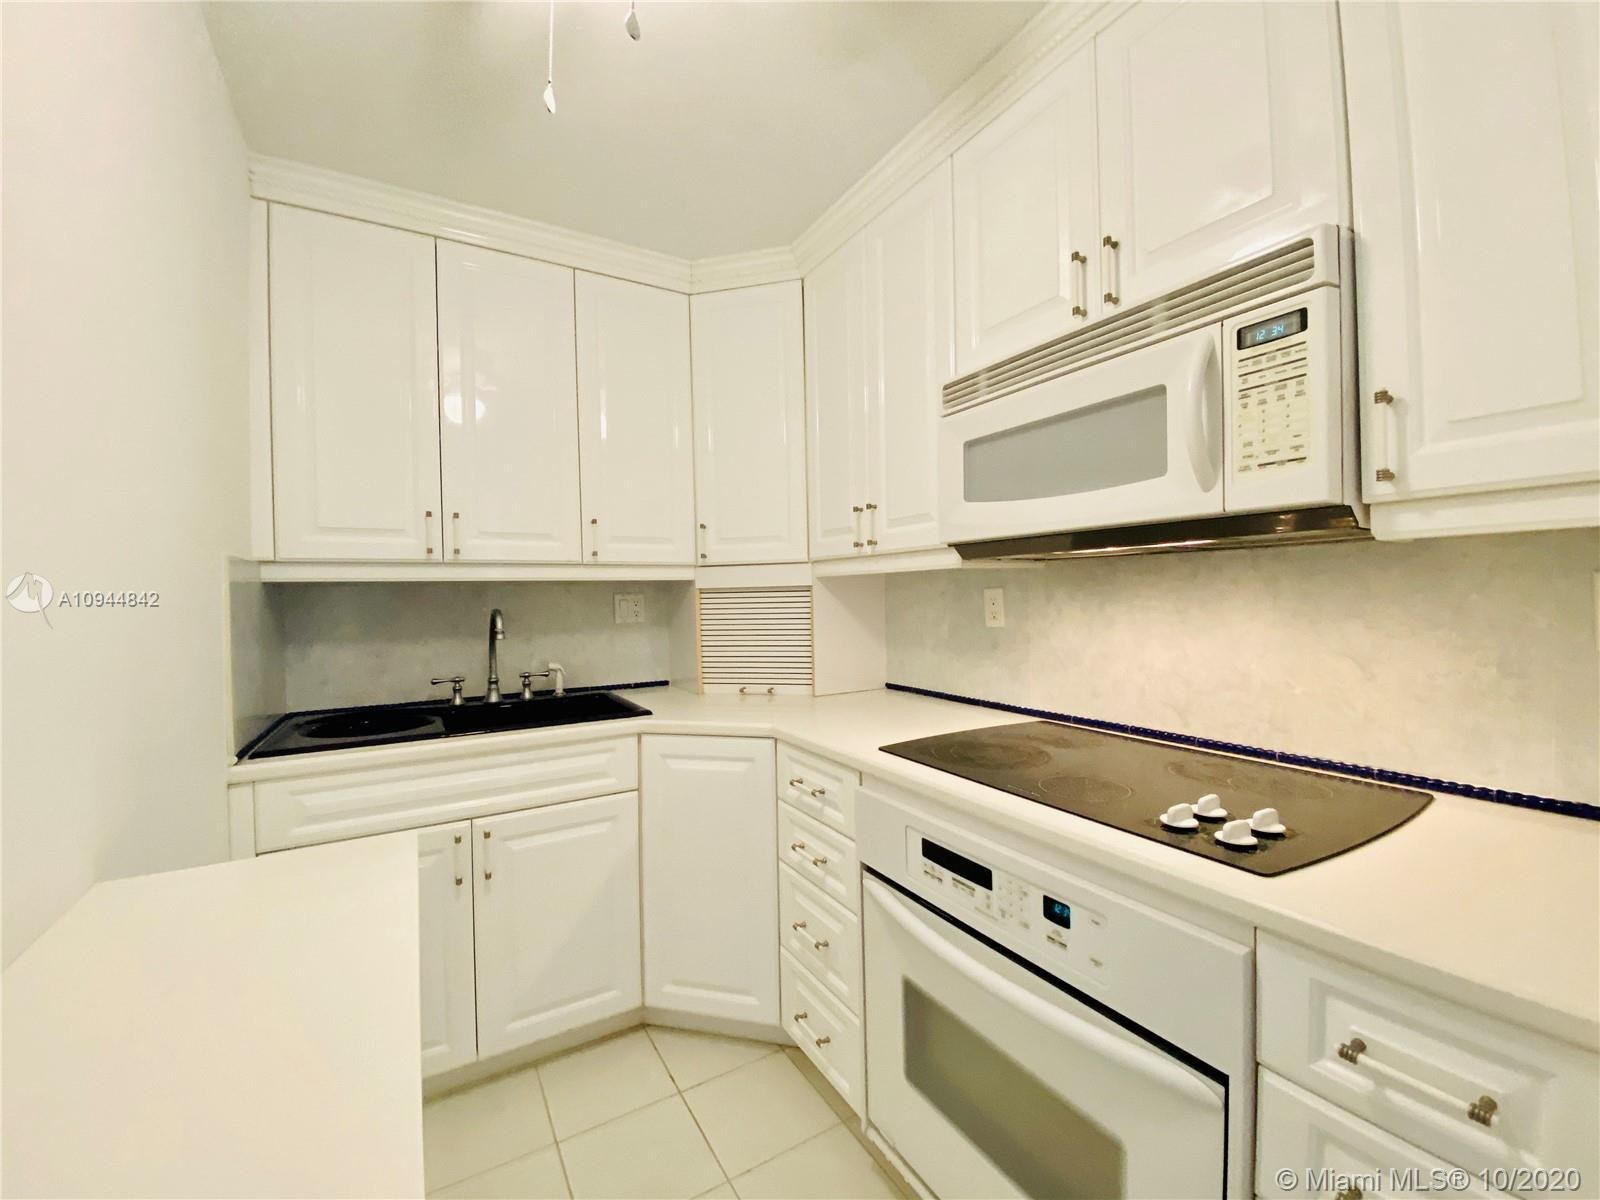 Photo of 2900 Banyan St #104, Fort Lauderdale, FL 33316 (MLS # A10944842)